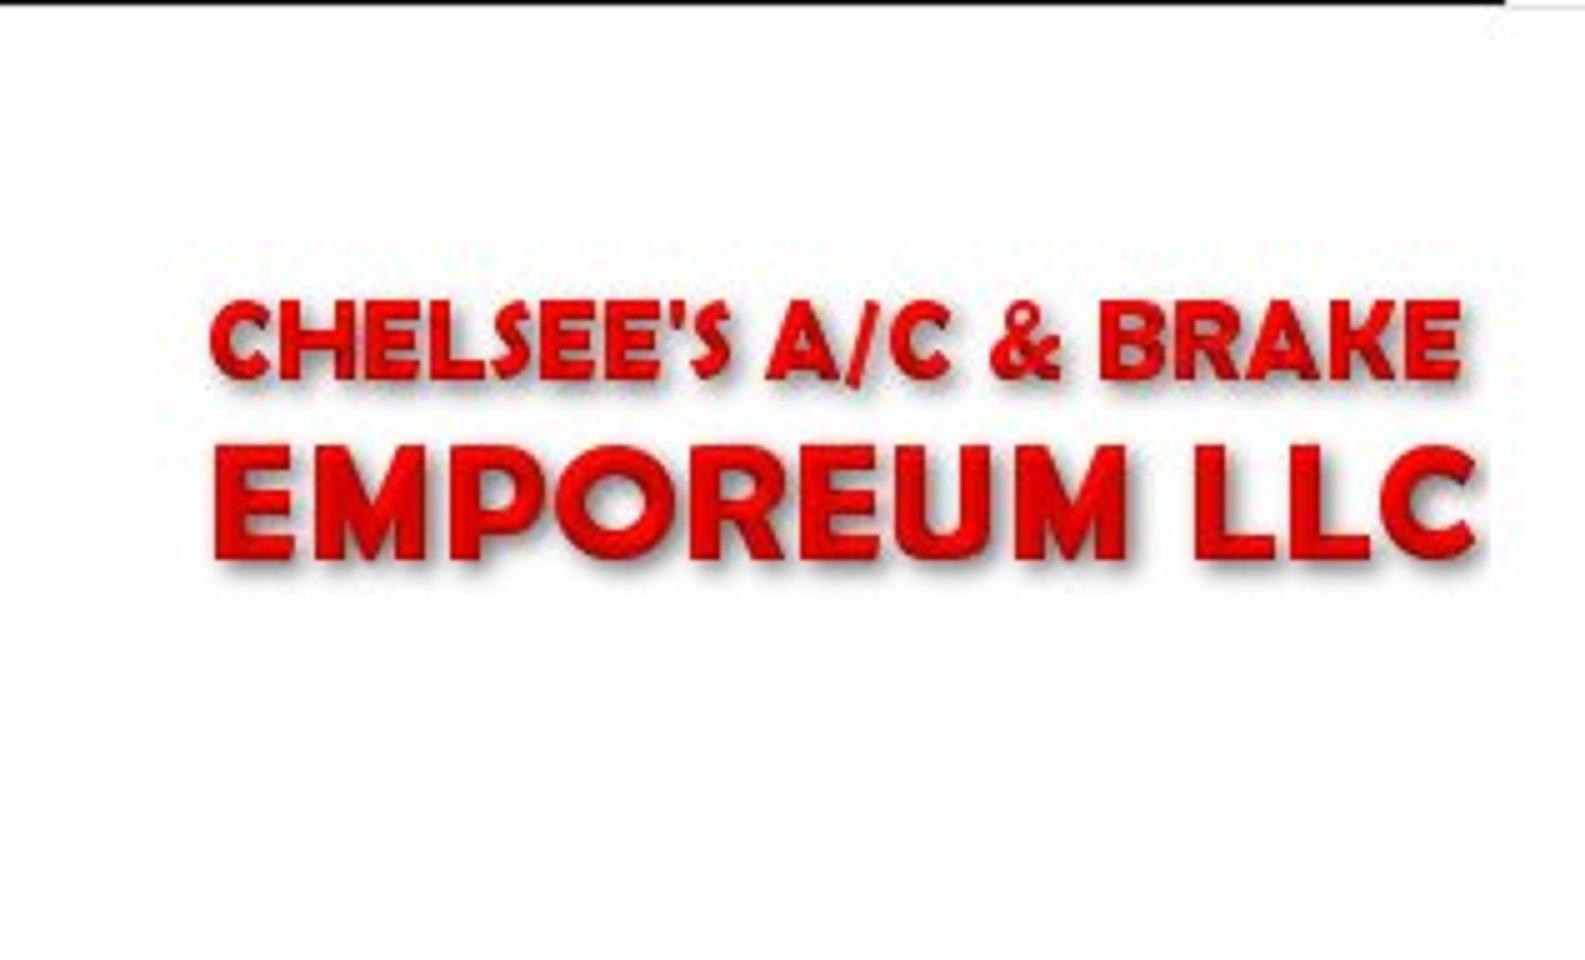 Chelsee's AC & Brake Emporeum LLC